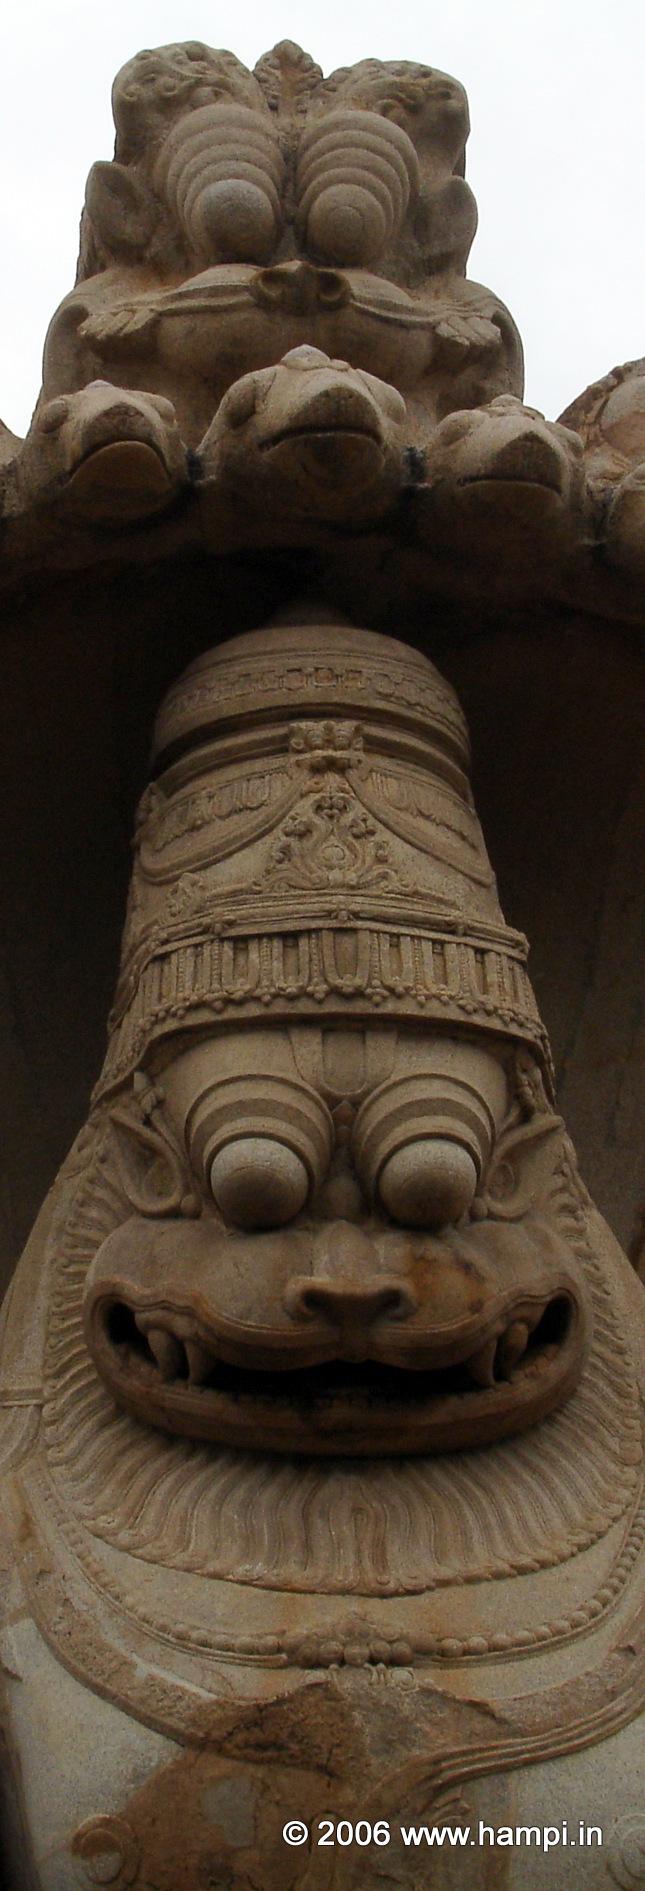 The iconic image of Narasimha at Hampi